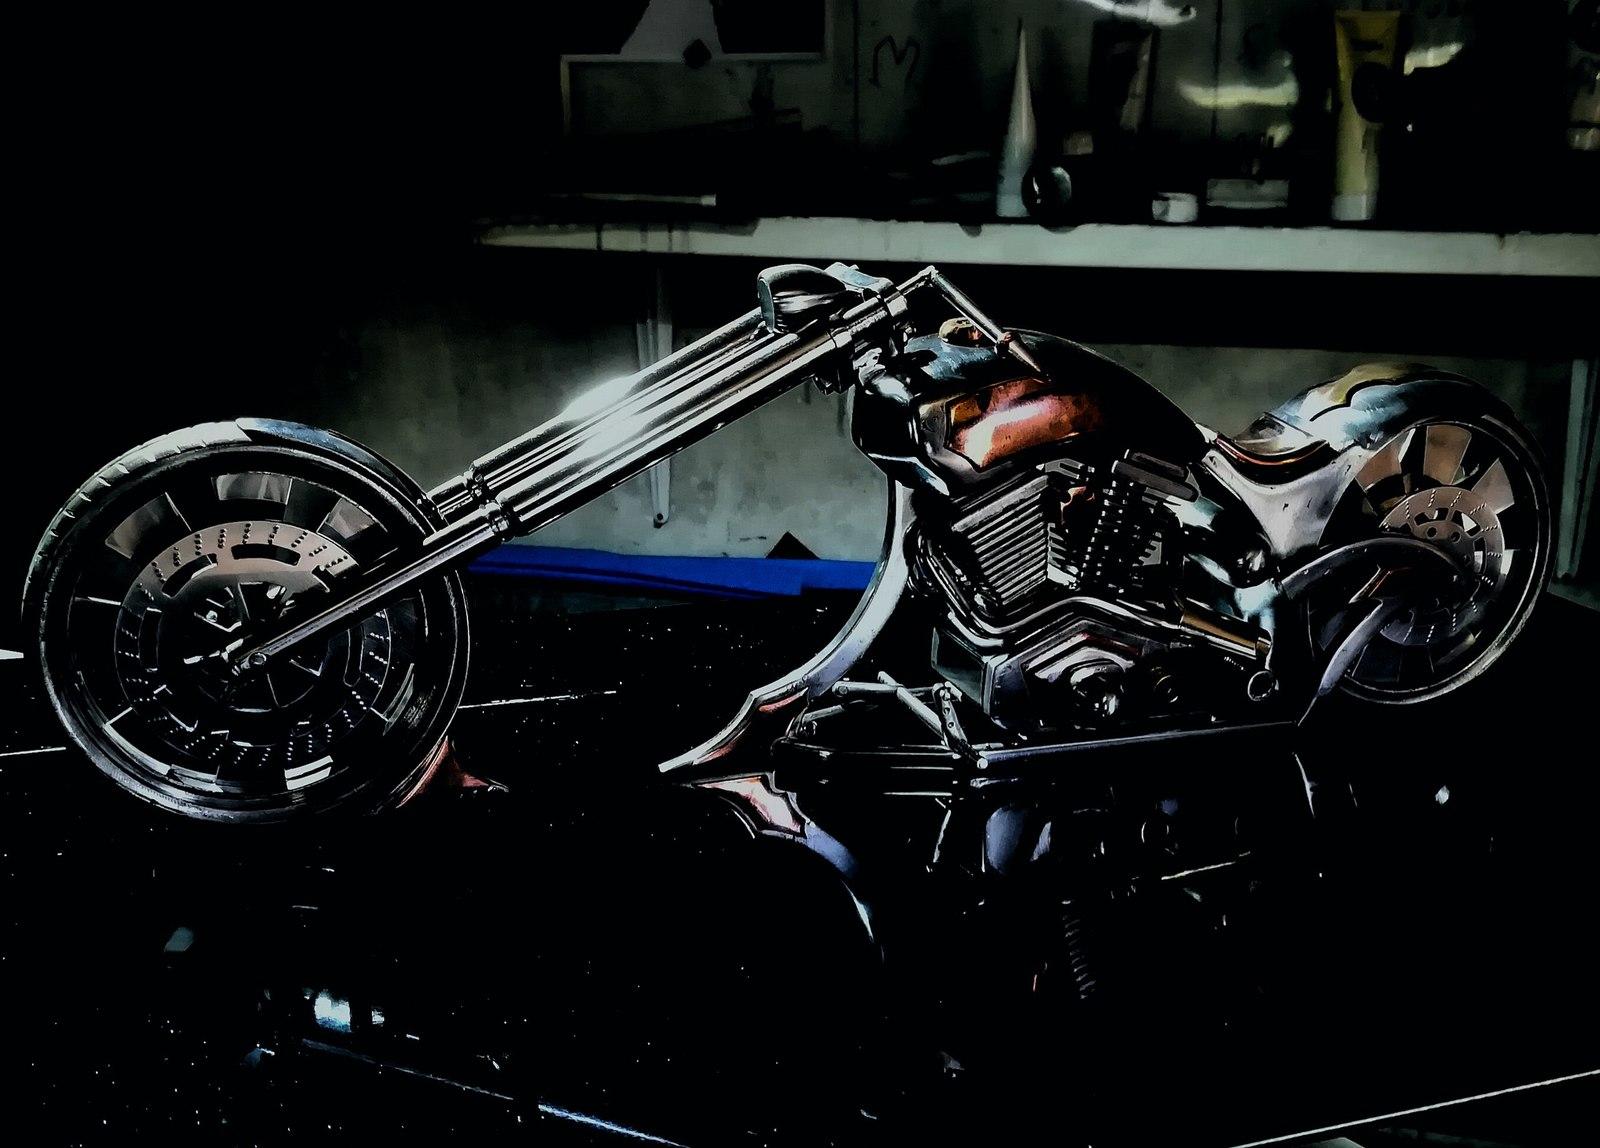 Сувенирный мотоцикл мотоцикл, сувенир